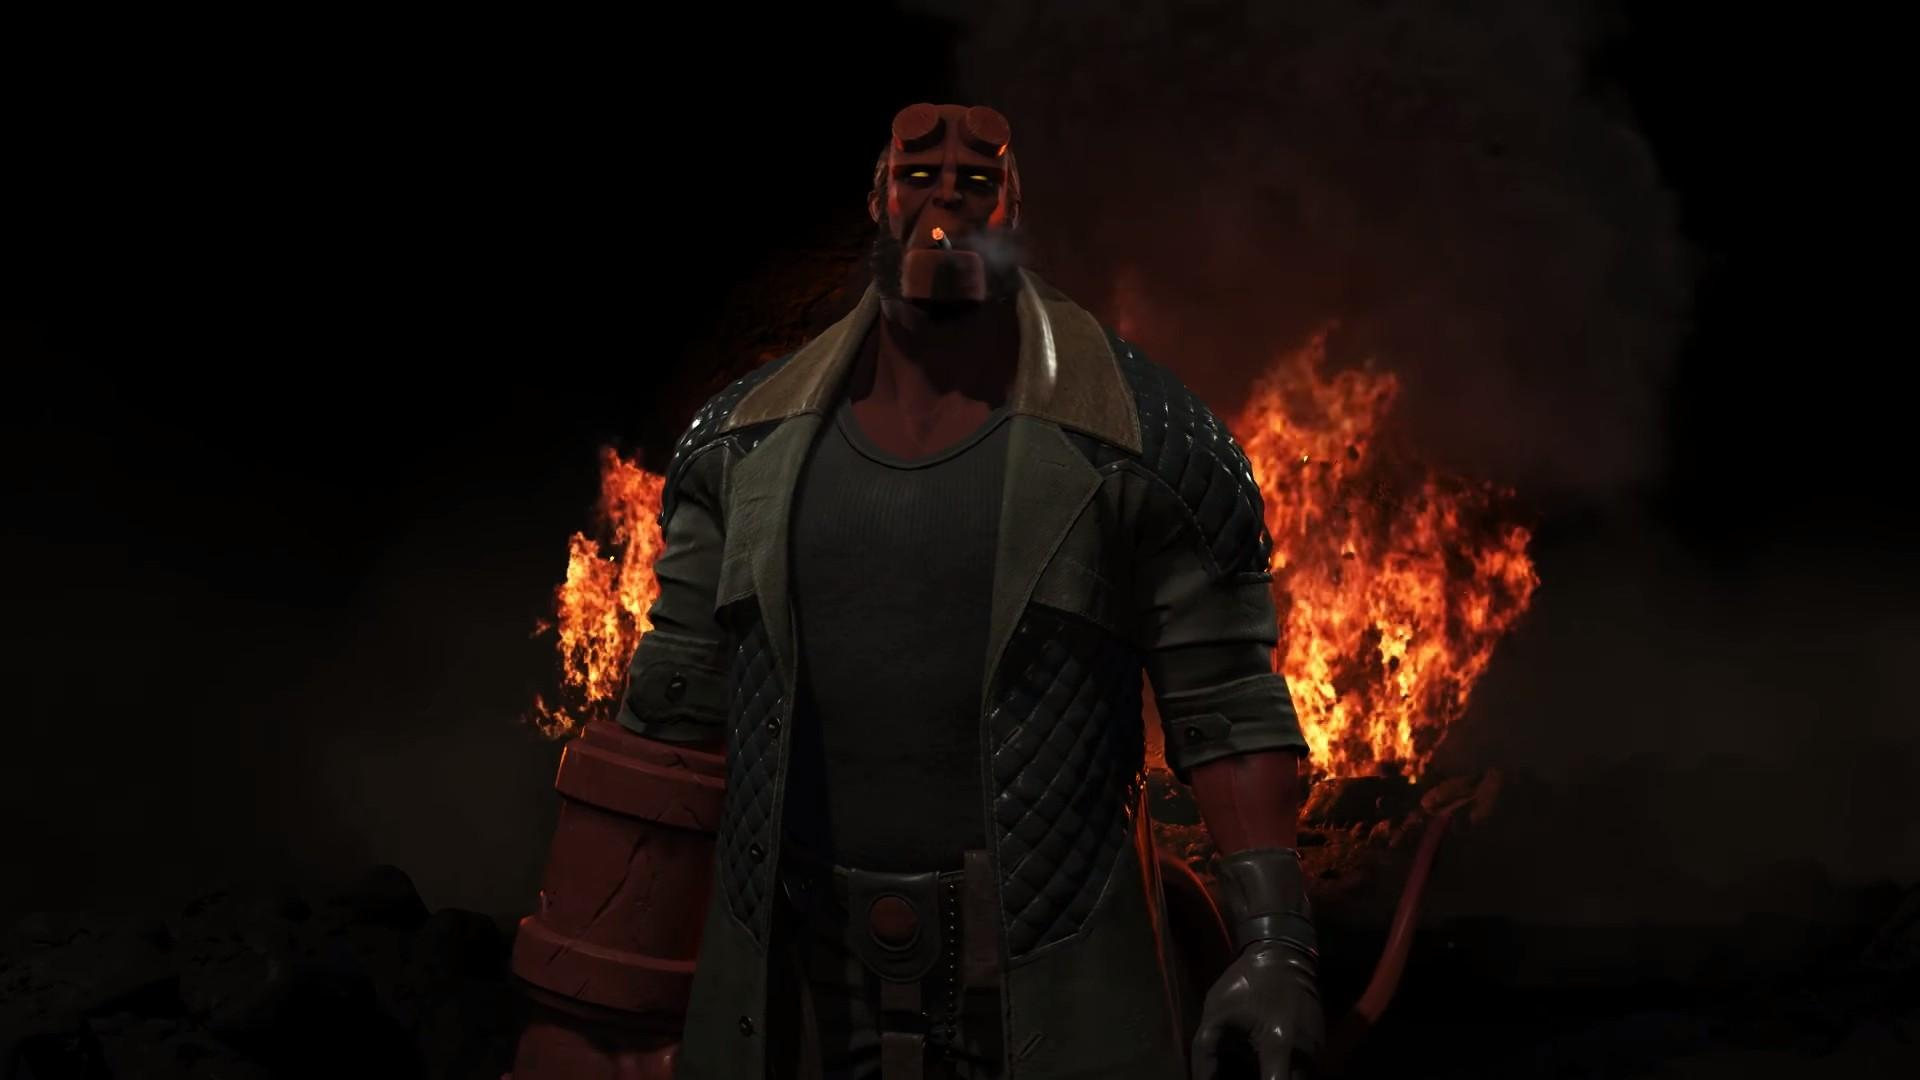 manta-negra-raiden-hellboy-injustice-2-frikigamers.com